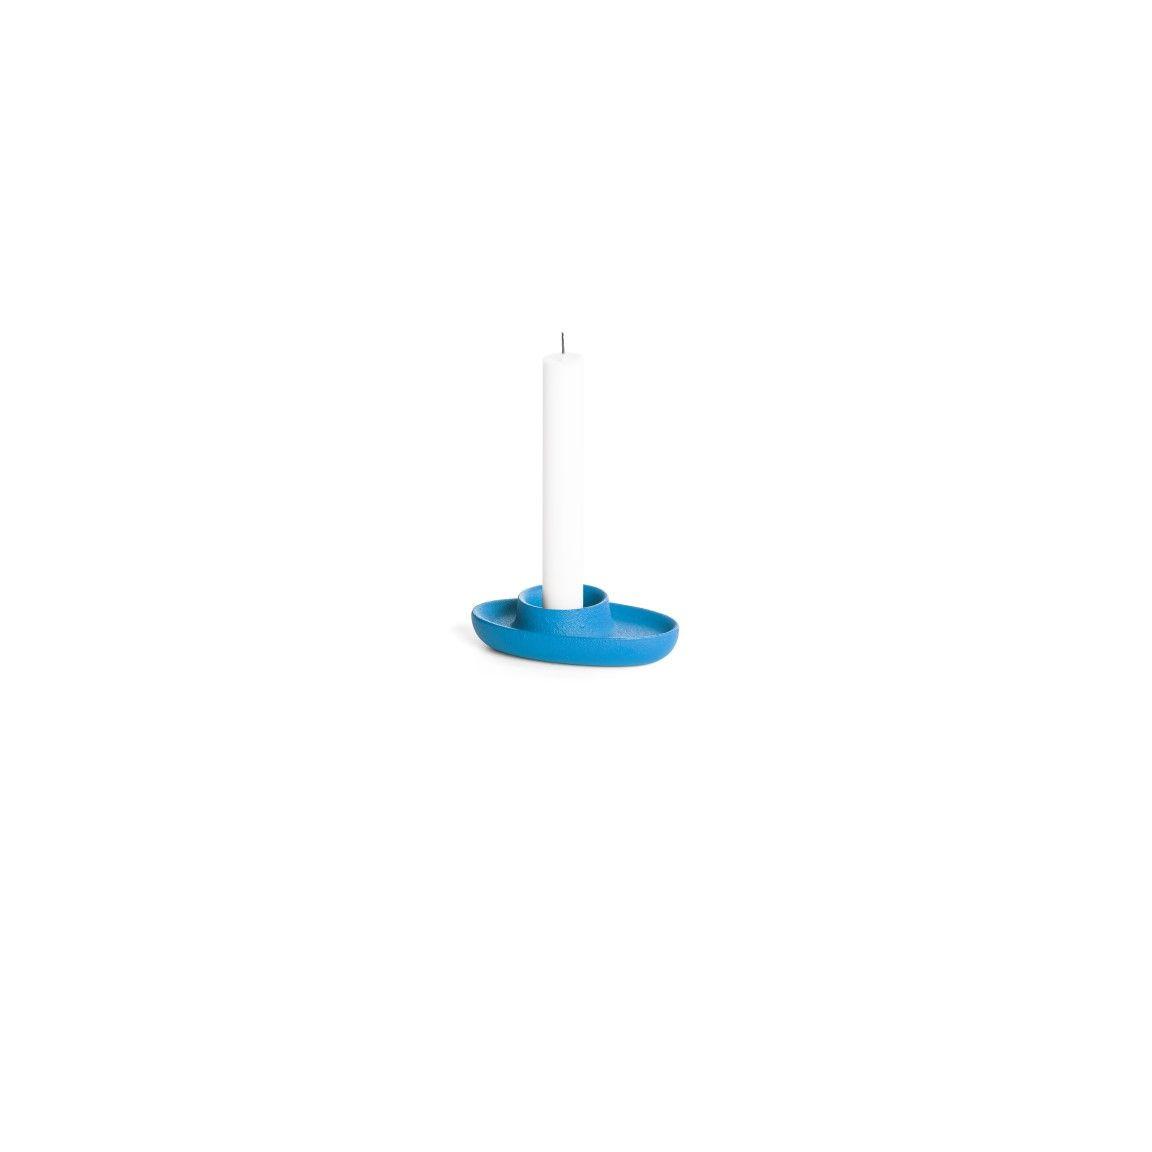 Kerzenhalter für 1 Kerze   Blau